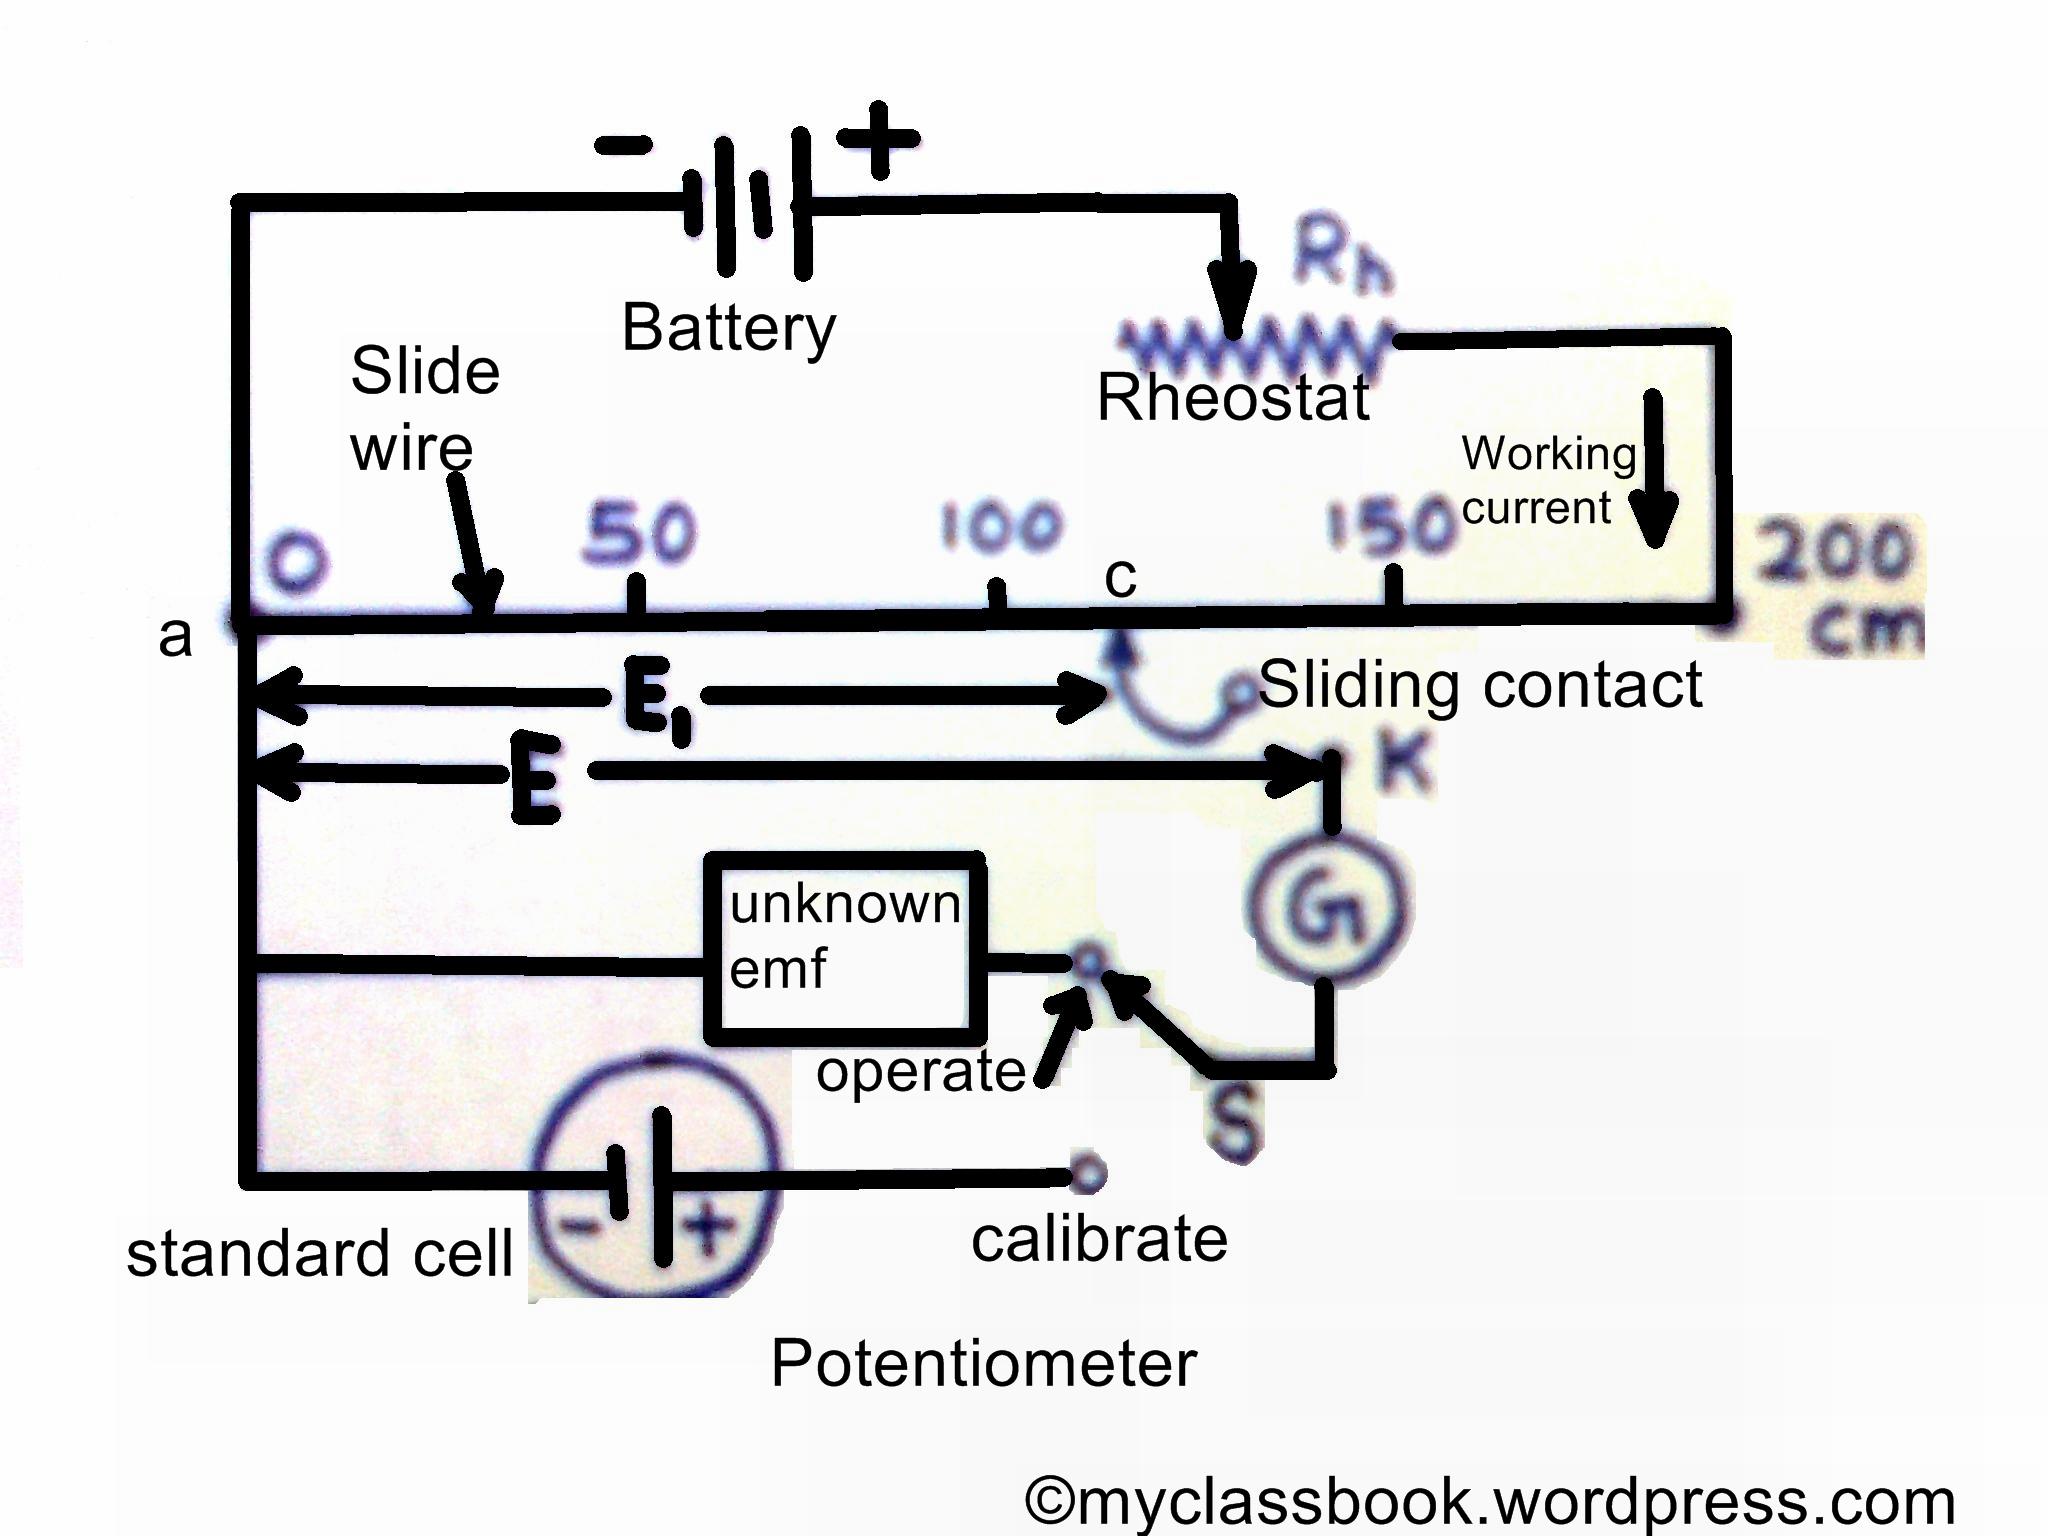 potentiometer method for low resistance measurement myclassbook